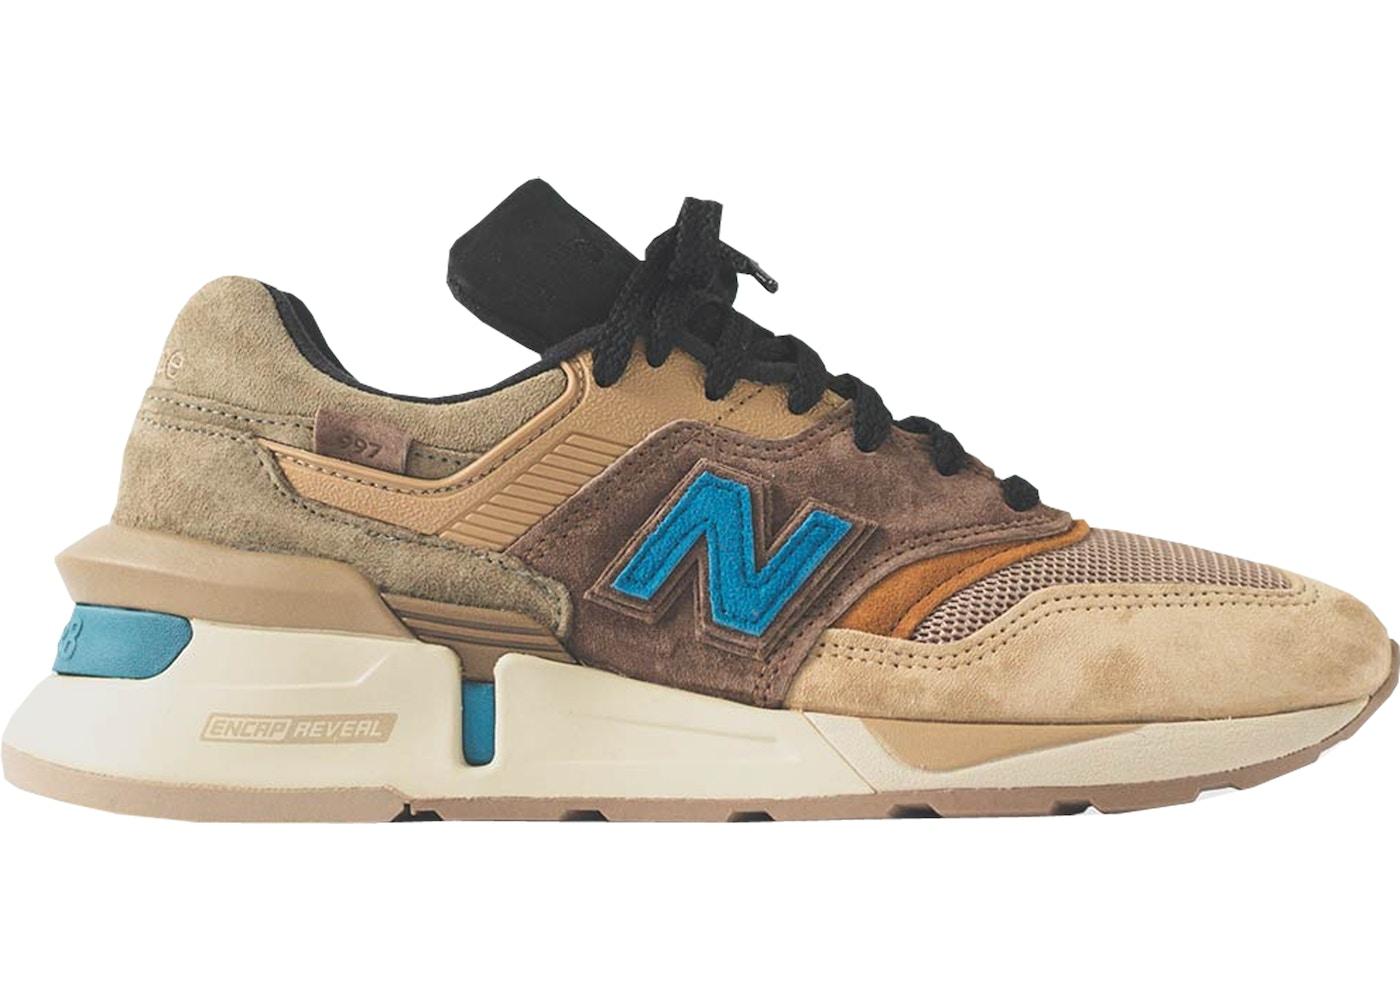 official photos f1884 93e0d New Balance Size 7.5 Shoes - New Lowest Asks